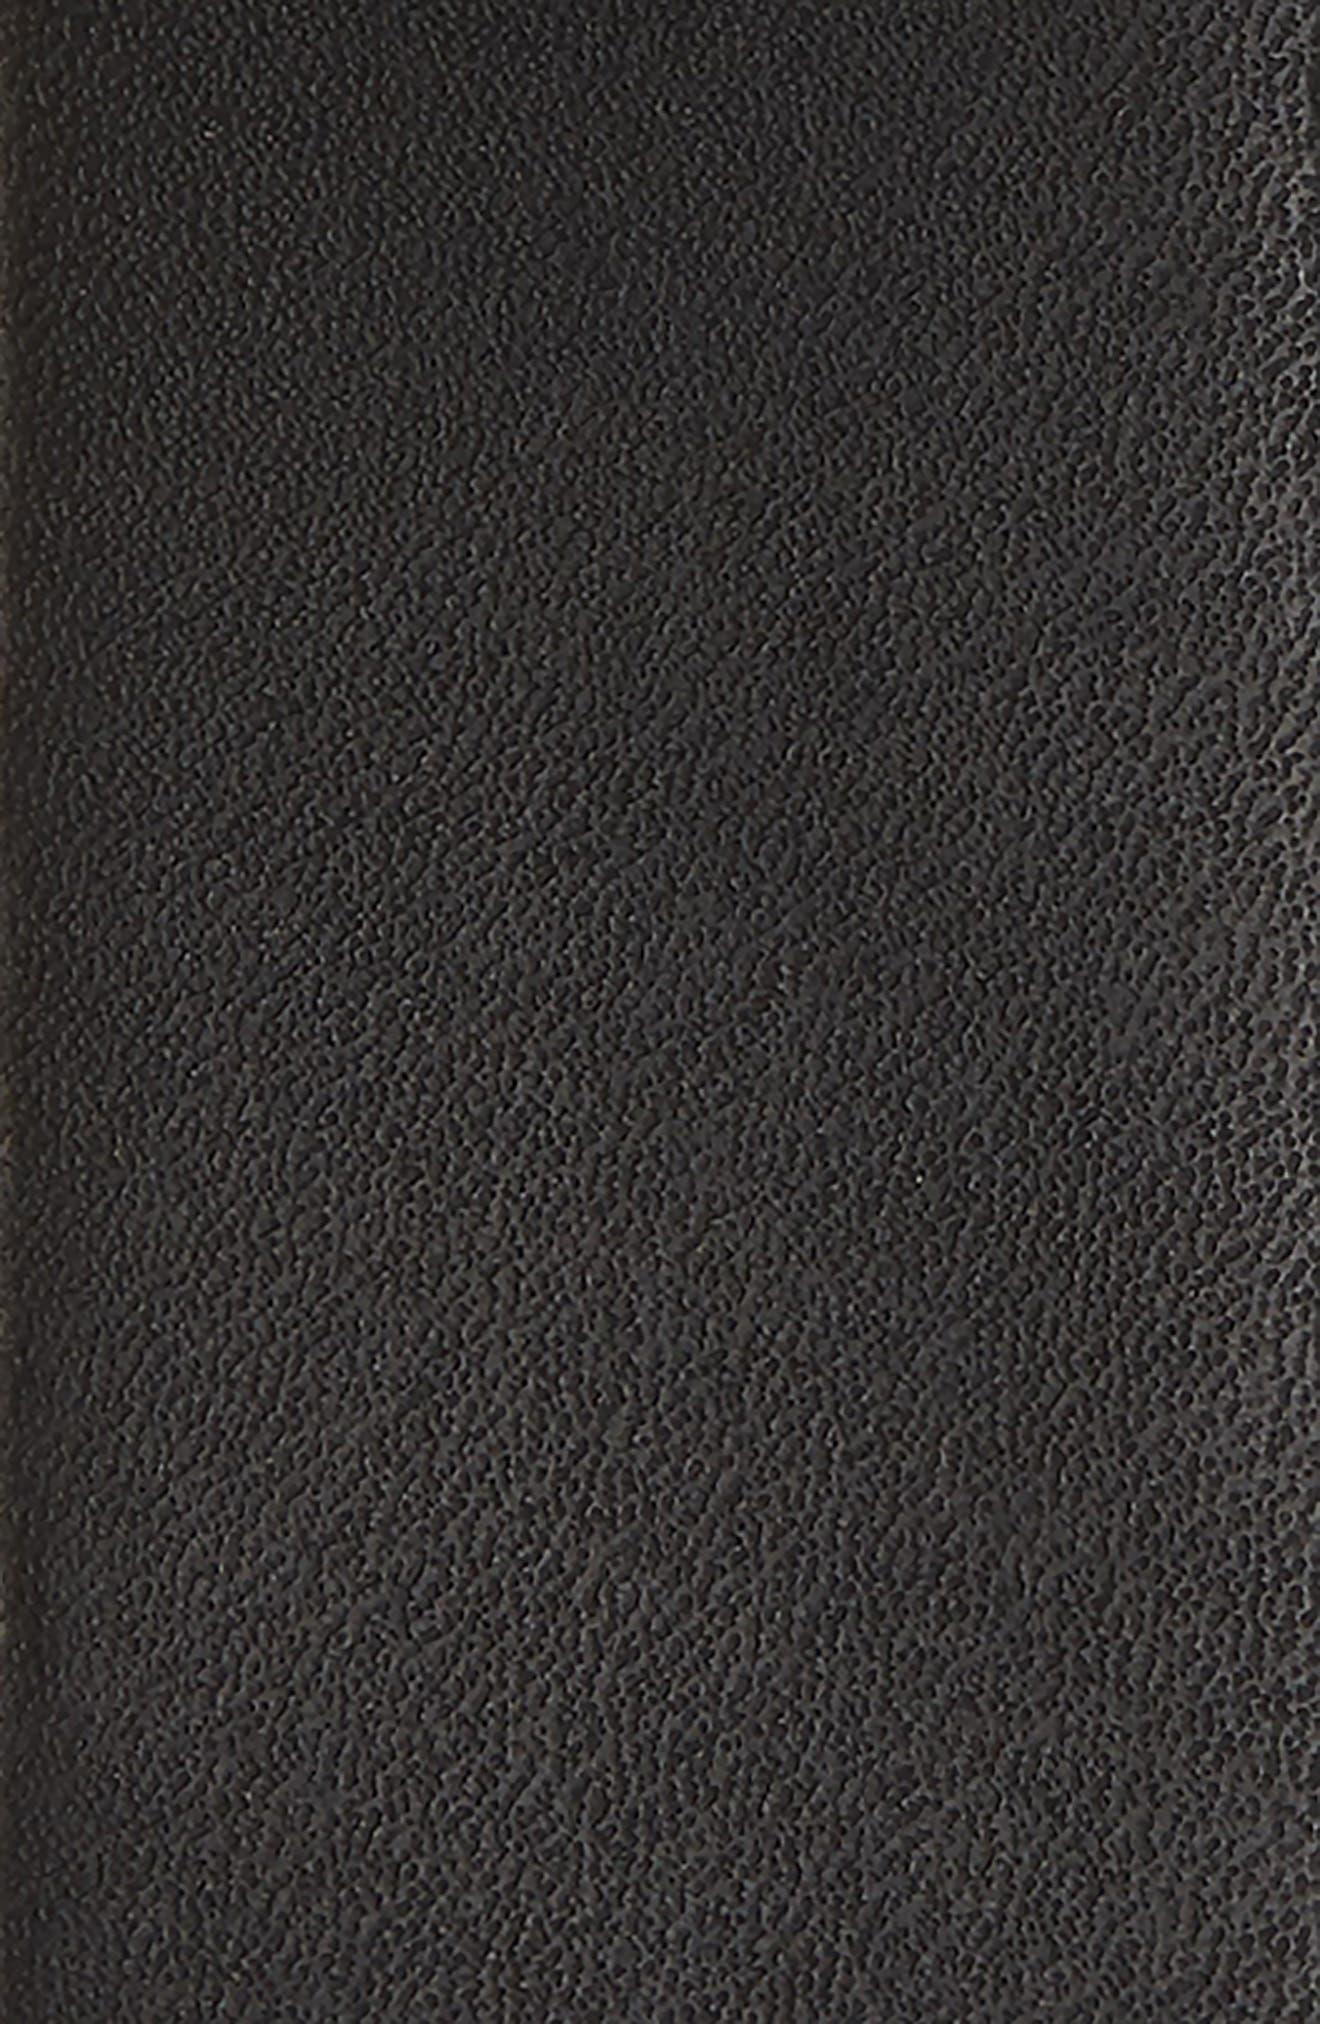 Monochrome Leather Belt,                             Alternate thumbnail 2, color,                             BLACK